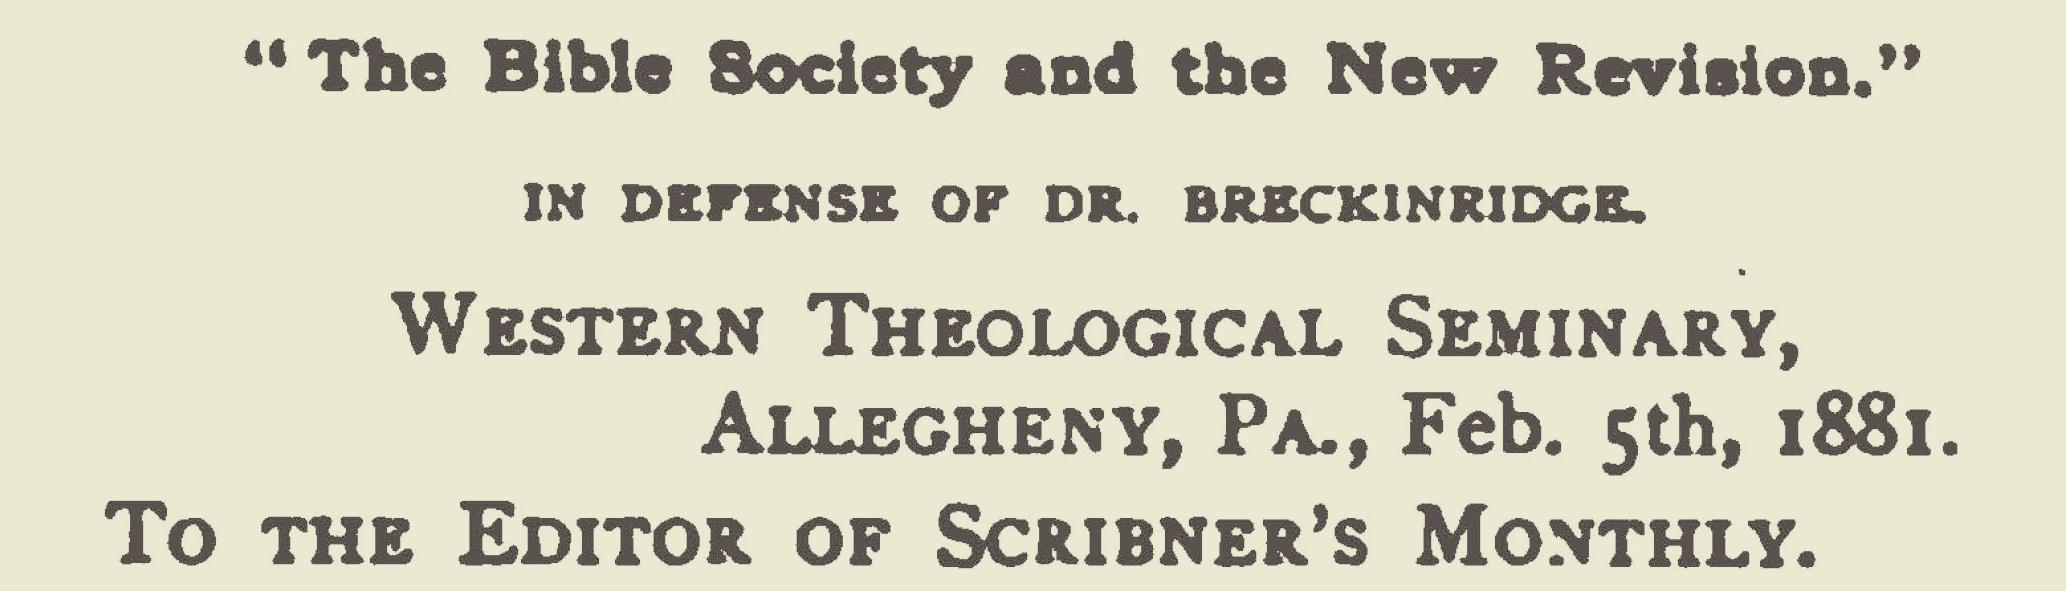 Warfield, Benjamin Breckinridge, In Defense of Dr. Breckinridge Title Page.jpg